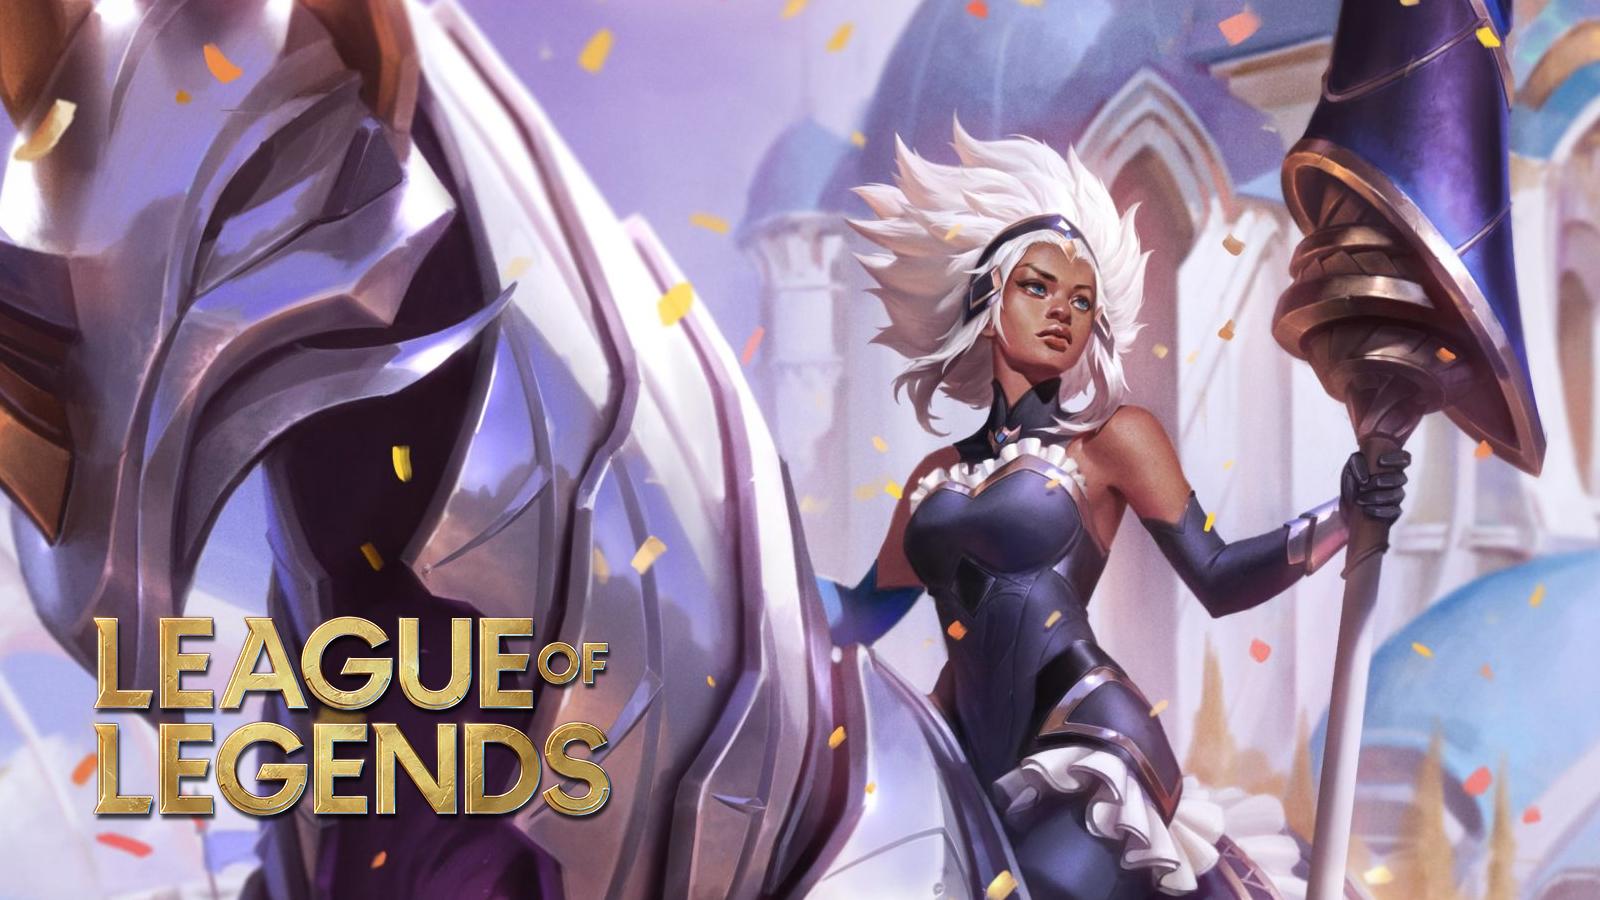 Battle Queen Rell in League of Legends